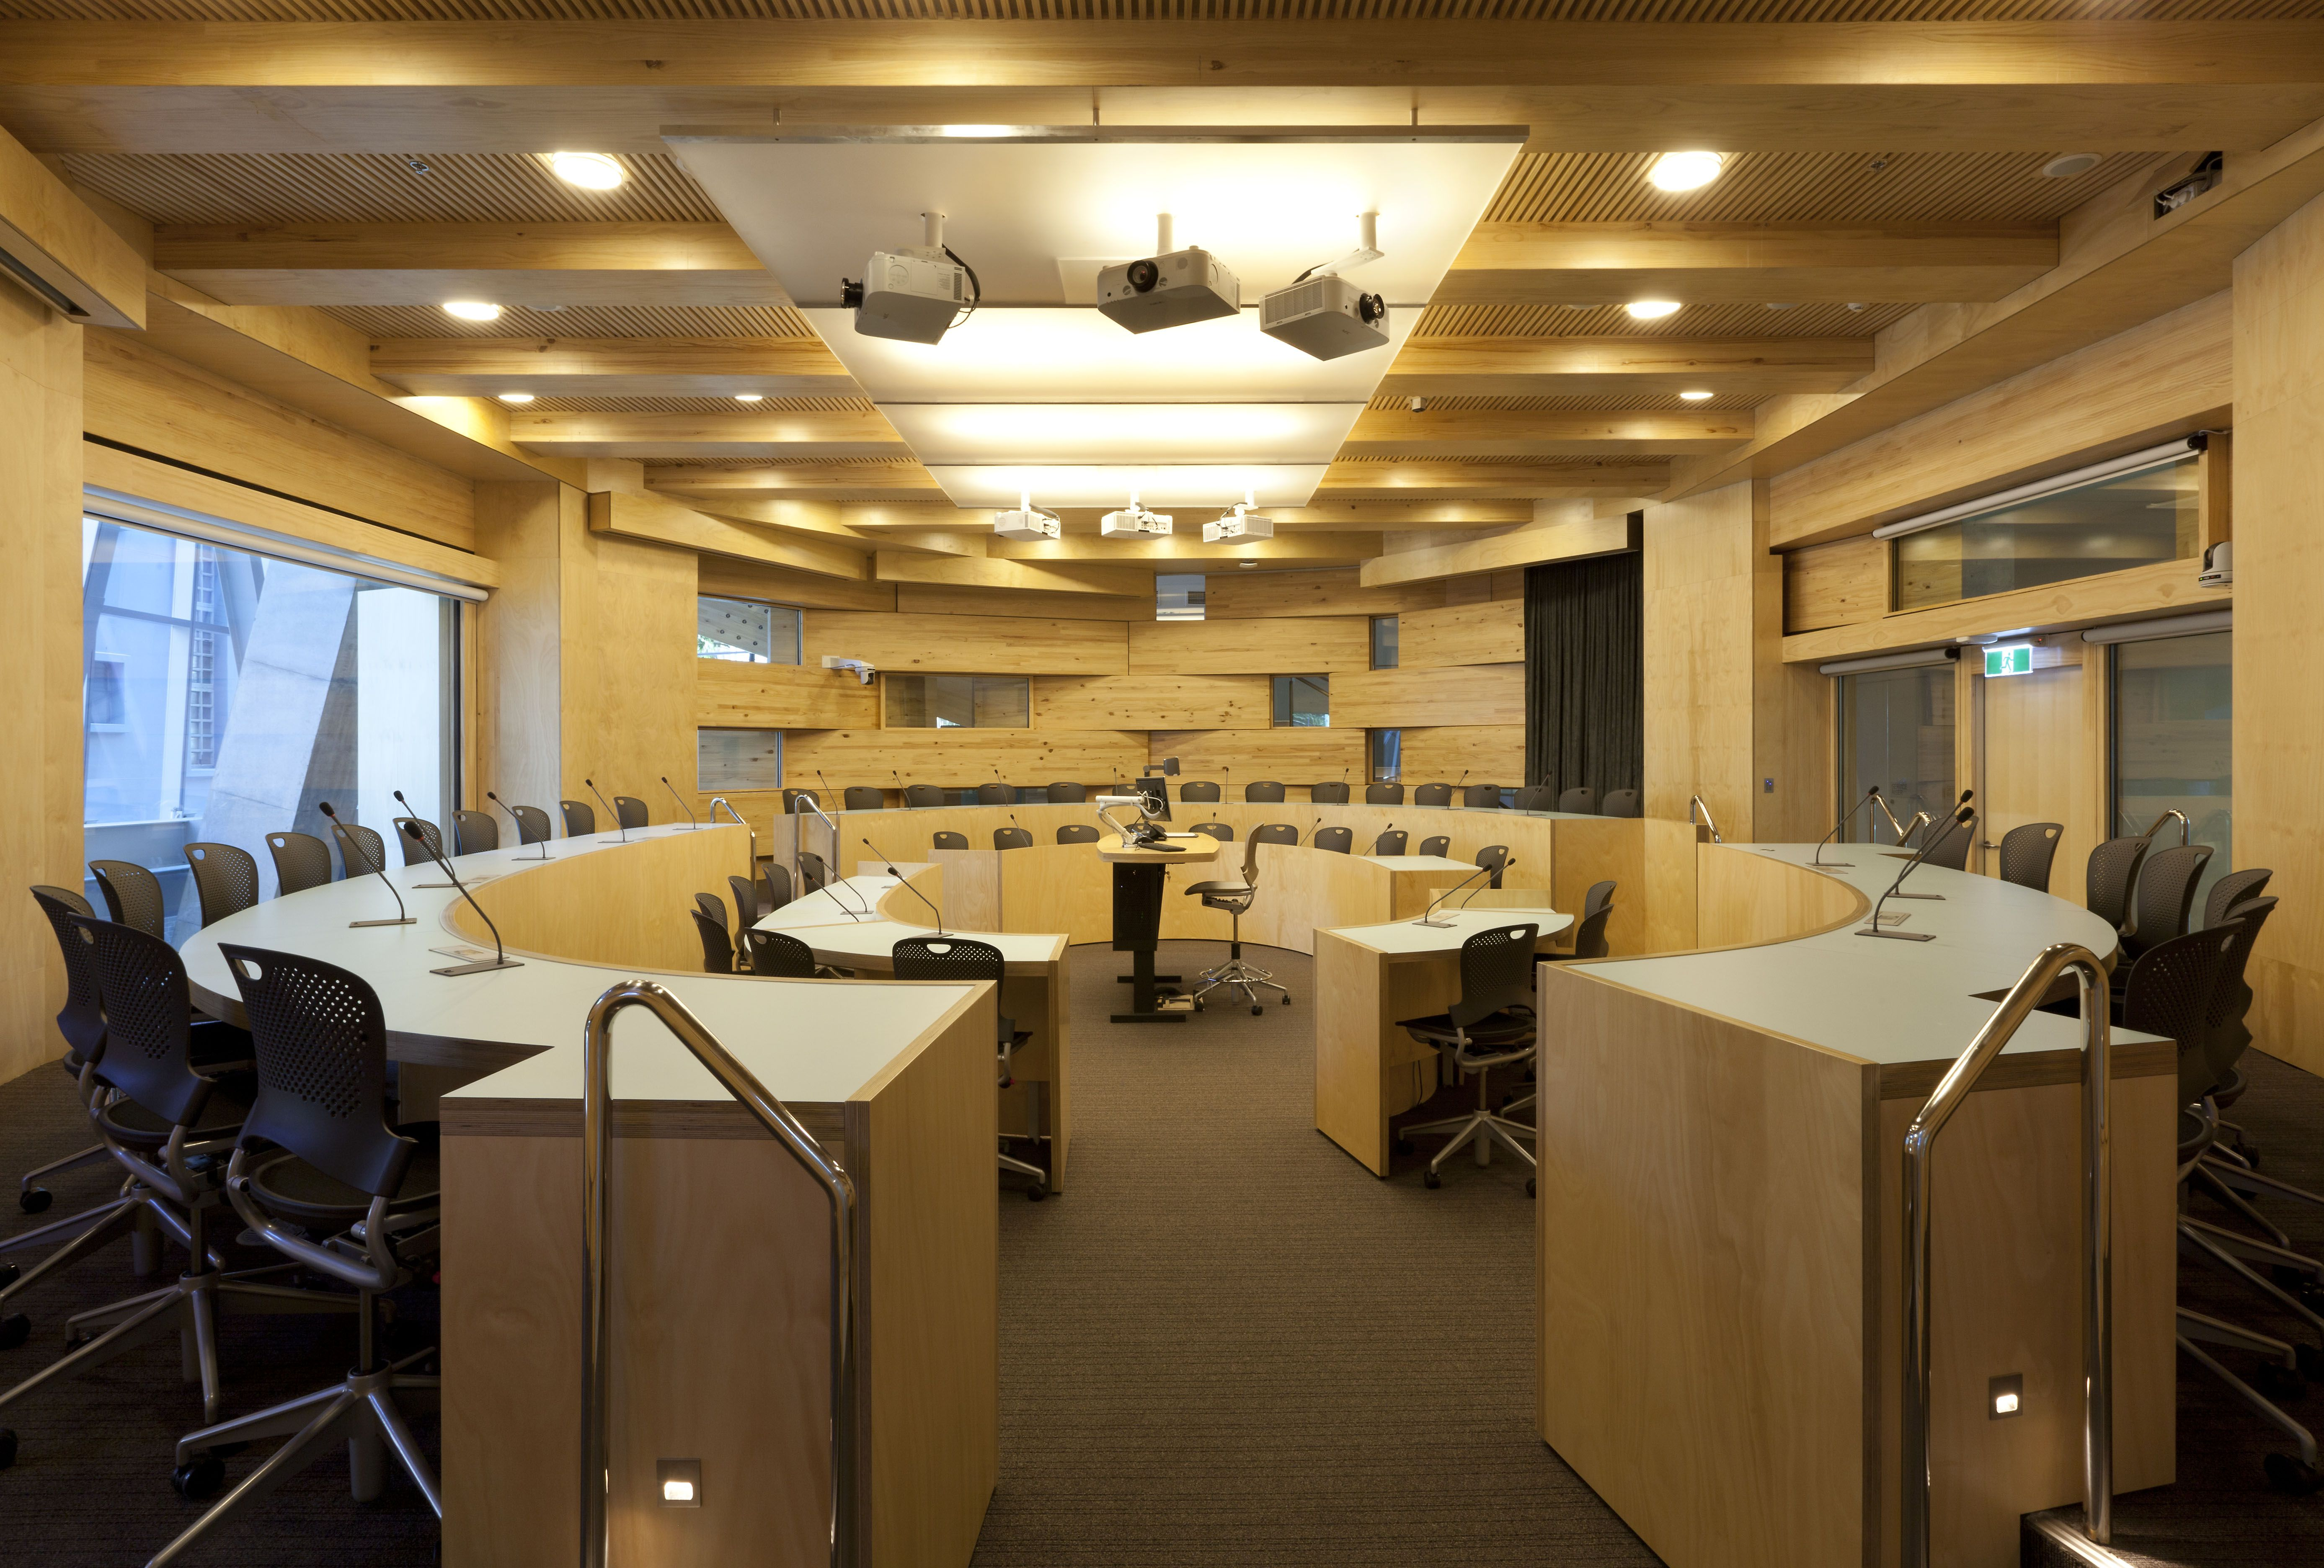 Gehry designed classroom, wood, circular, modern lighting, outside windows, UTS in Sydney